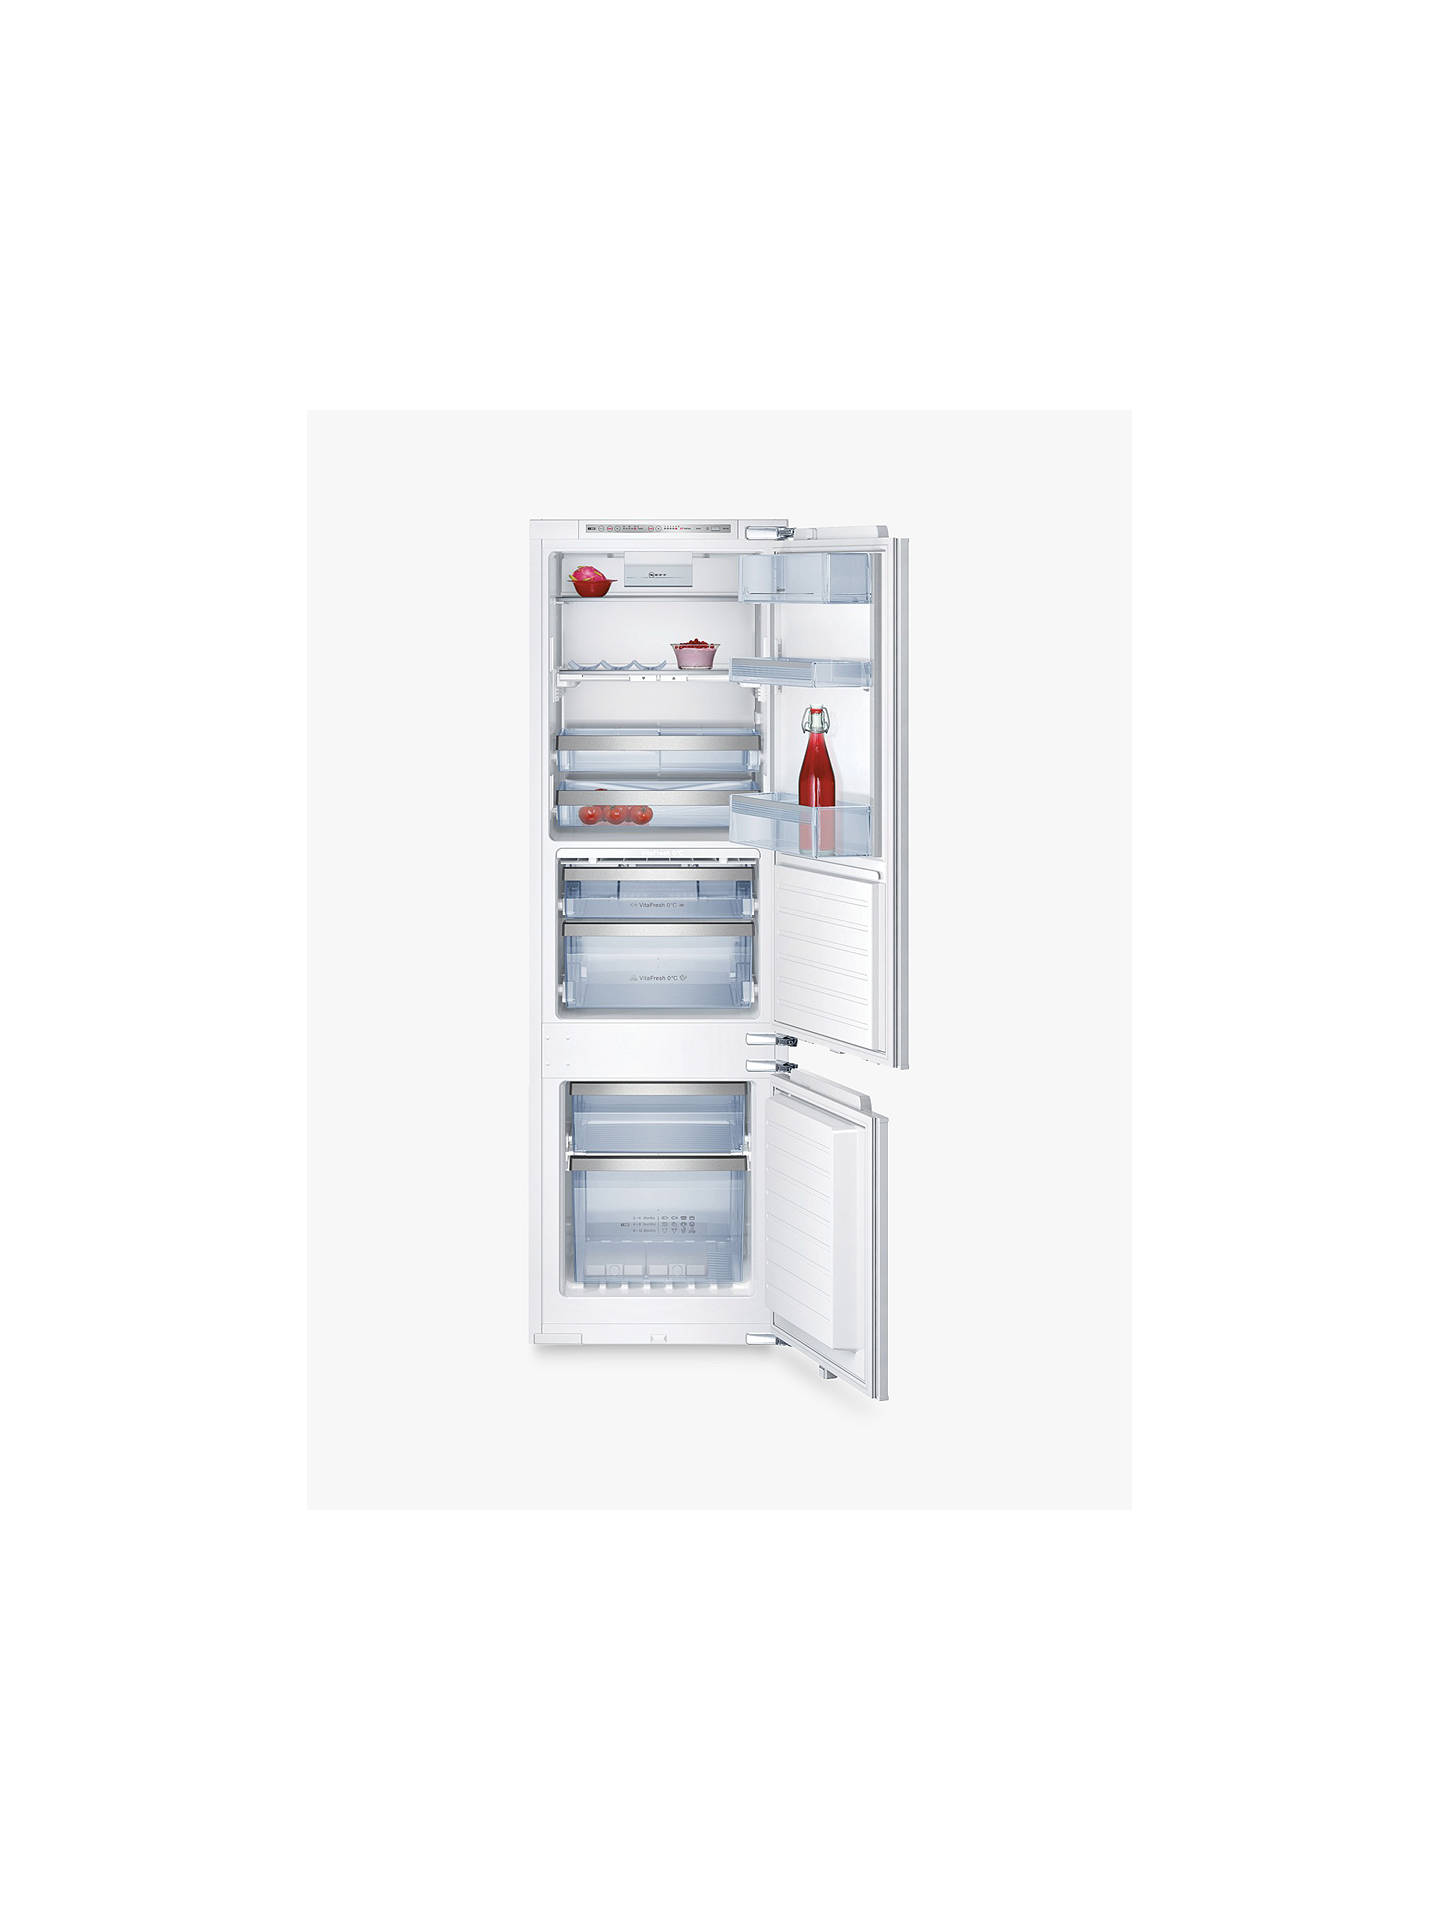 da48cea5609 Buy Neff K8345X0 Integrated Fridge Freezer